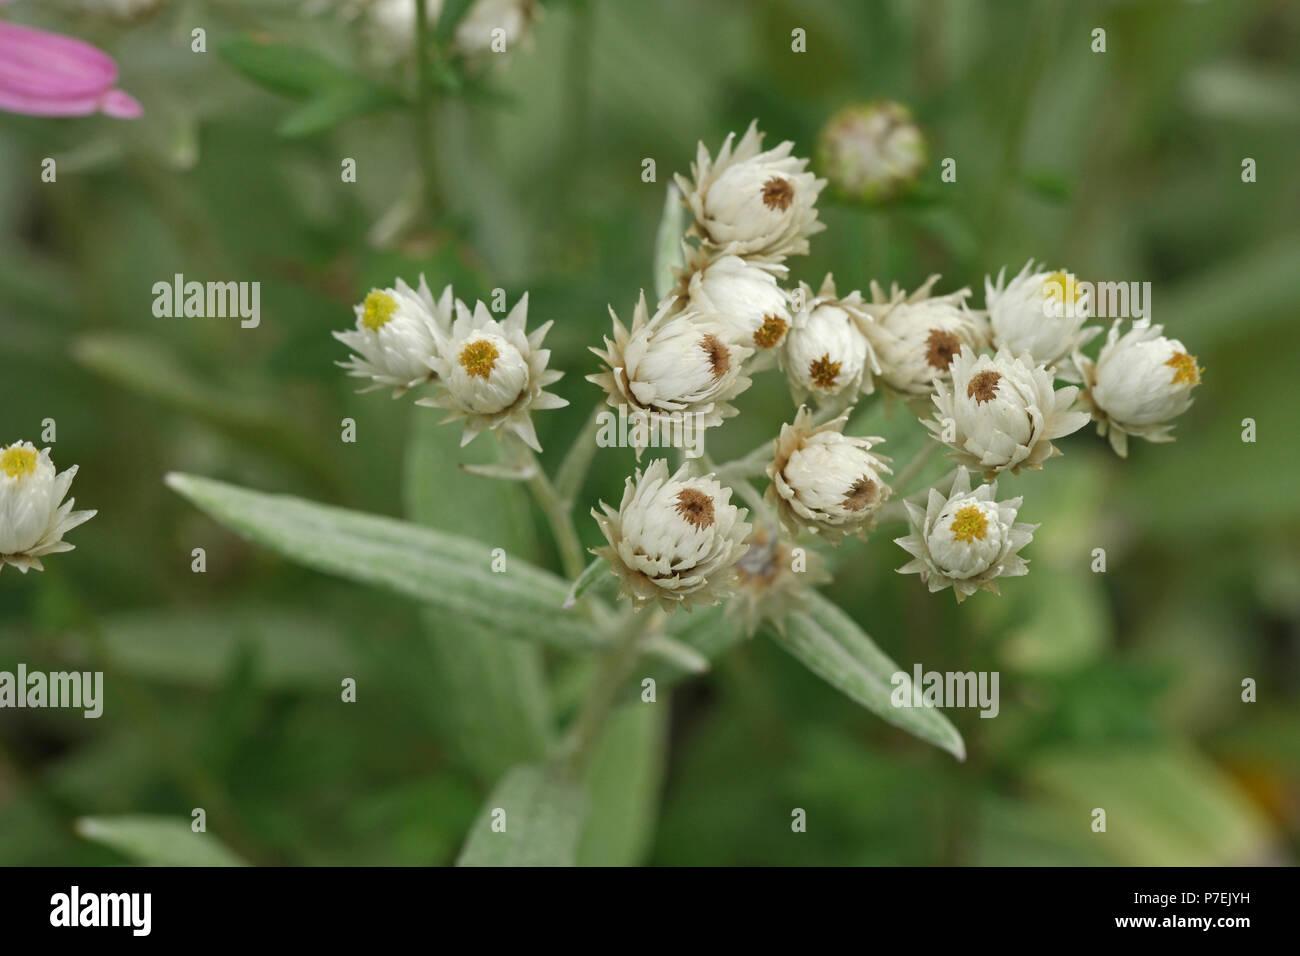 Anaphalis triplinervis (Perlkörbchen) (triple veteado everlastin nacarado) (Immortelle de l'Himalaya) Foto de stock